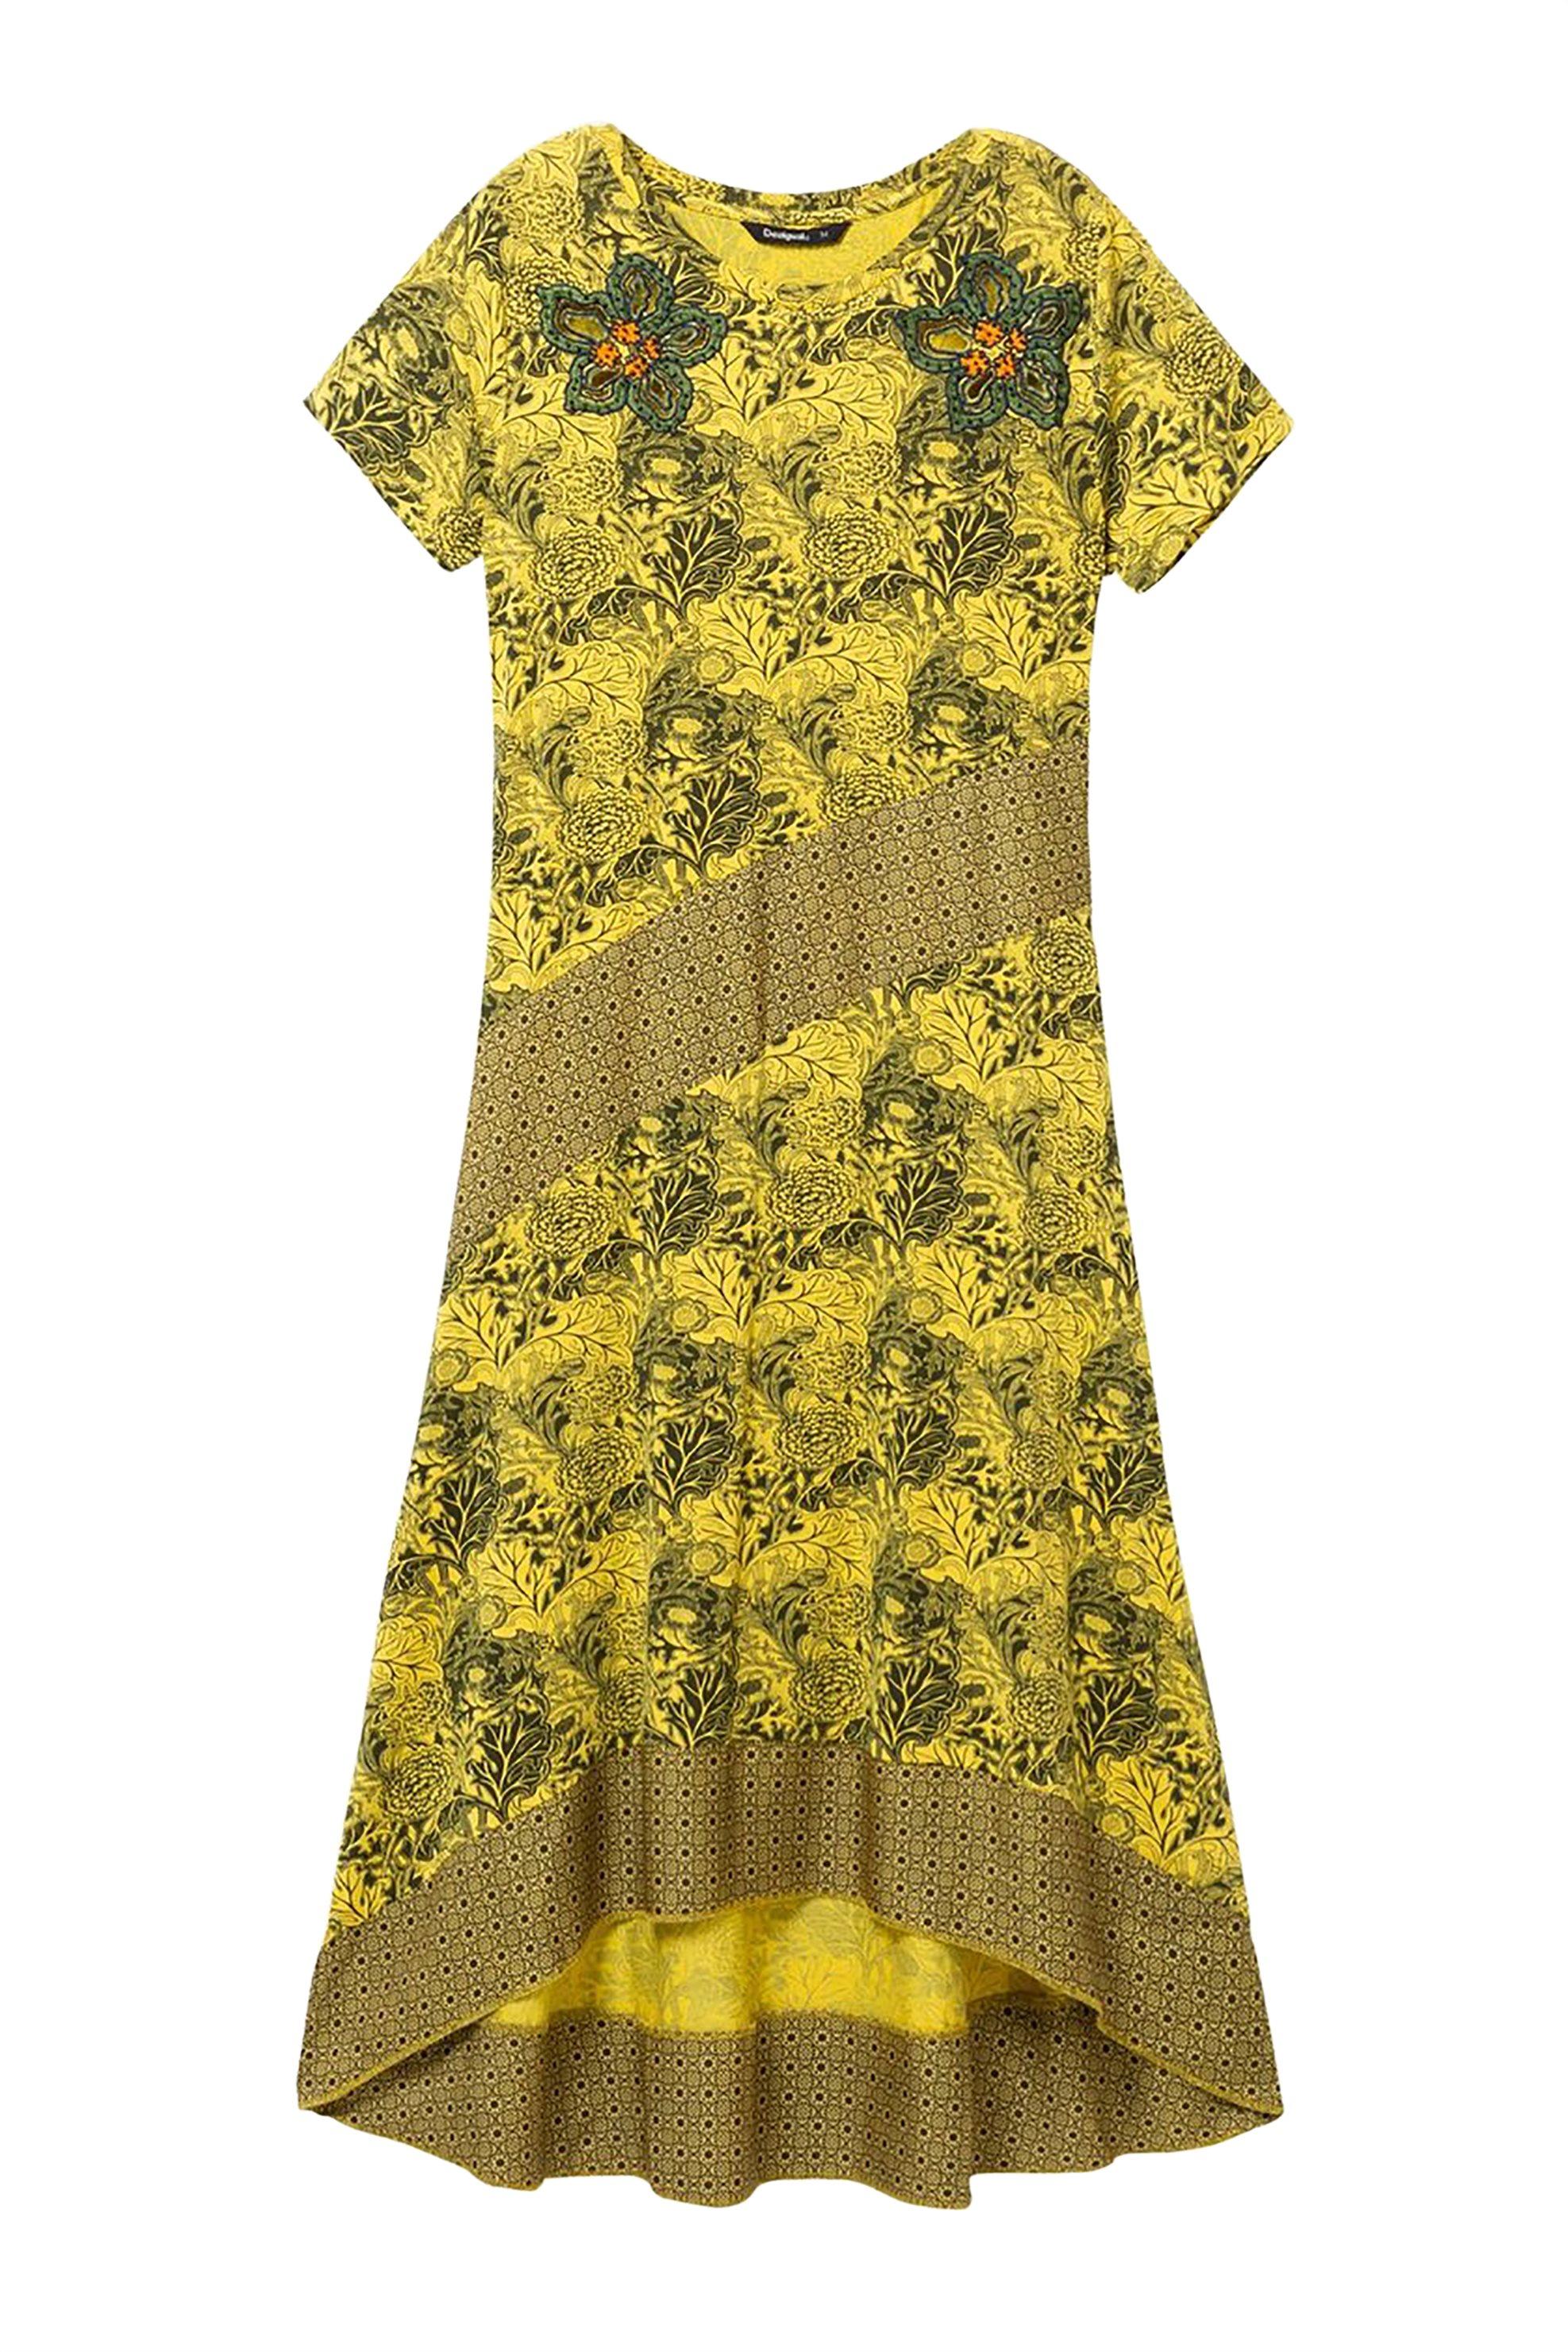 Desigual γυναικείo φόρεμα ασύμμετρο Duna - 19SWVK54 - Μουσταρδί γυναικα   ρουχα   φορέματα   midi φορέματα